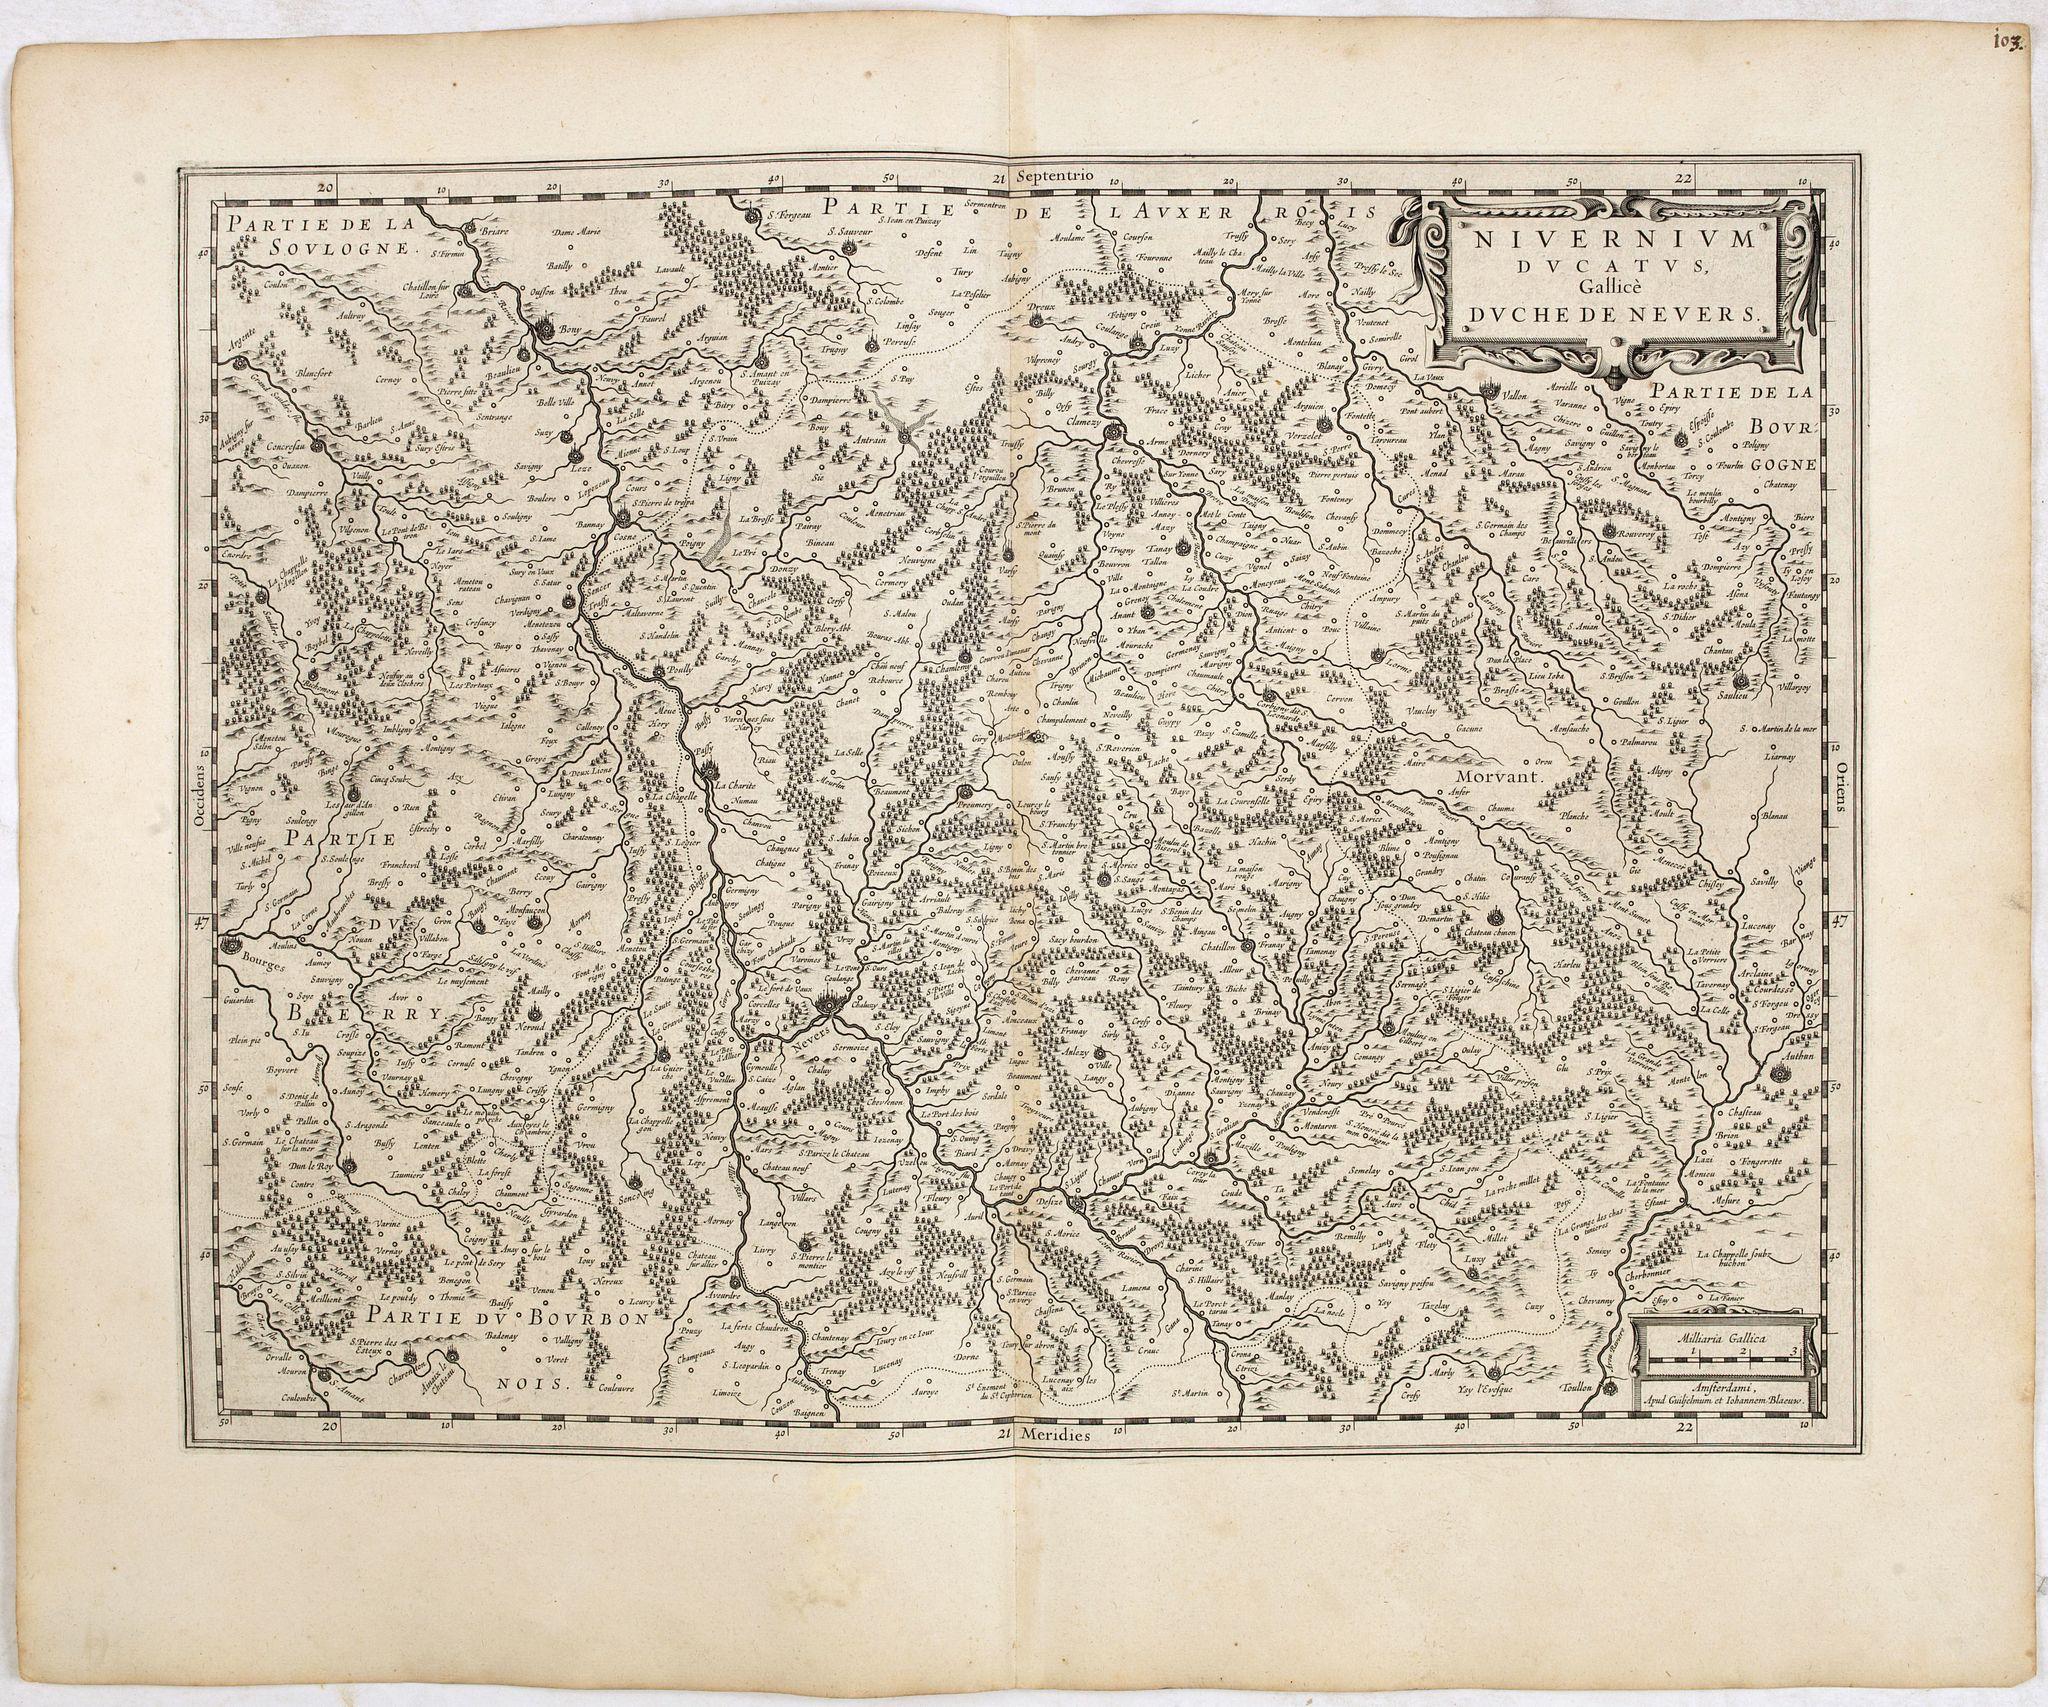 BLAEU, W. -  Nivernium Ducatus. Gallicèa Duche de Nevers.